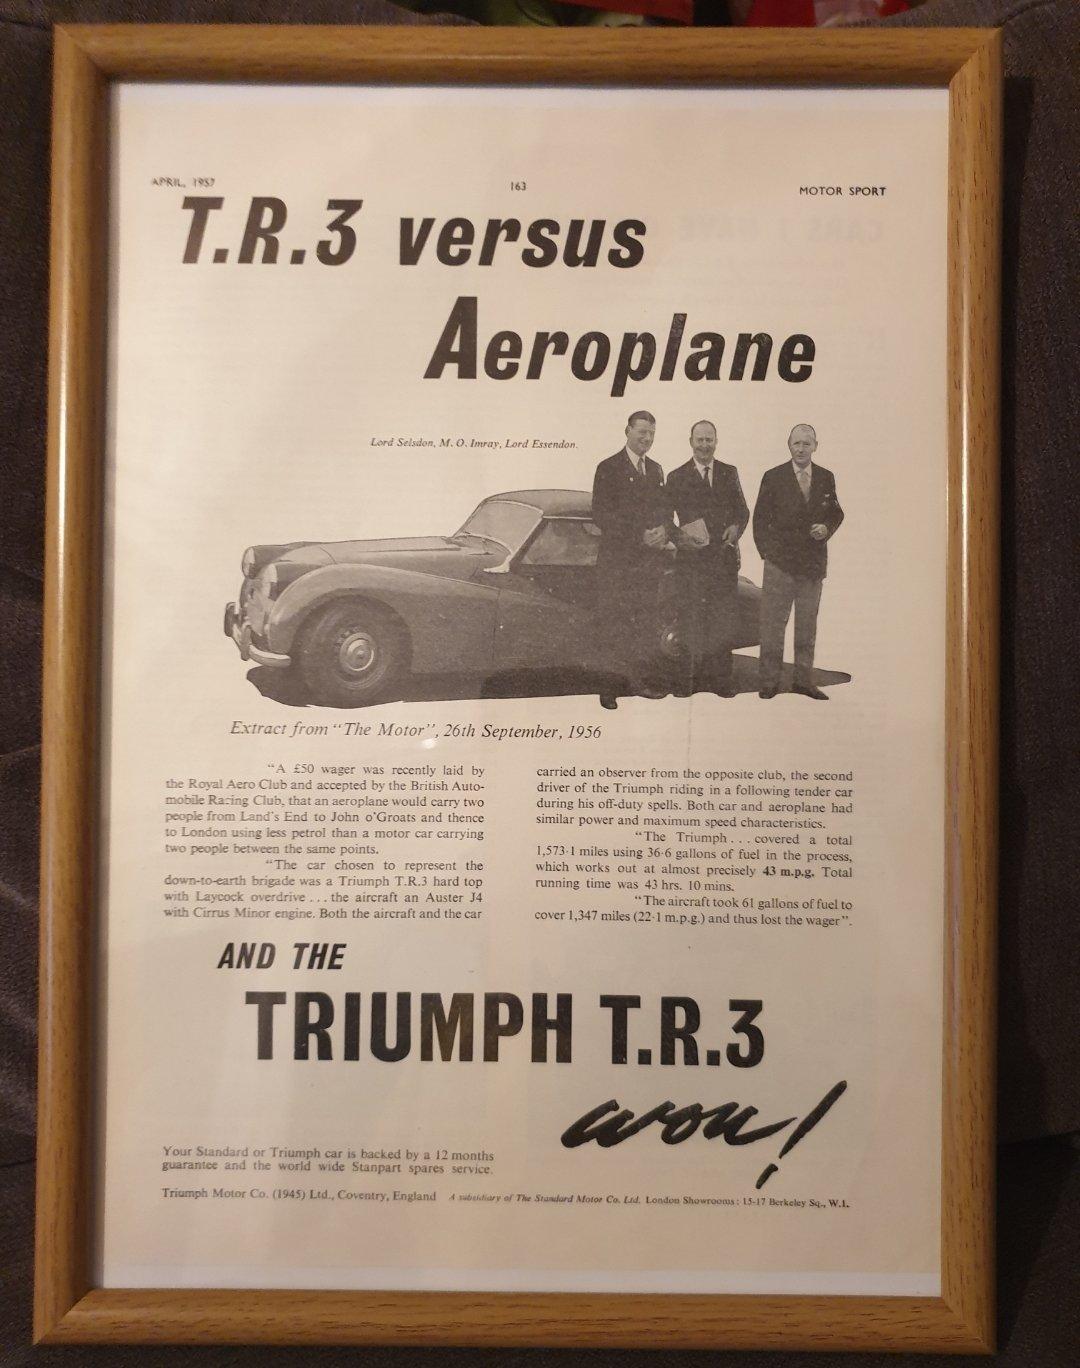 1957 Triumph TR3 Advert Original  For Sale (picture 1 of 2)